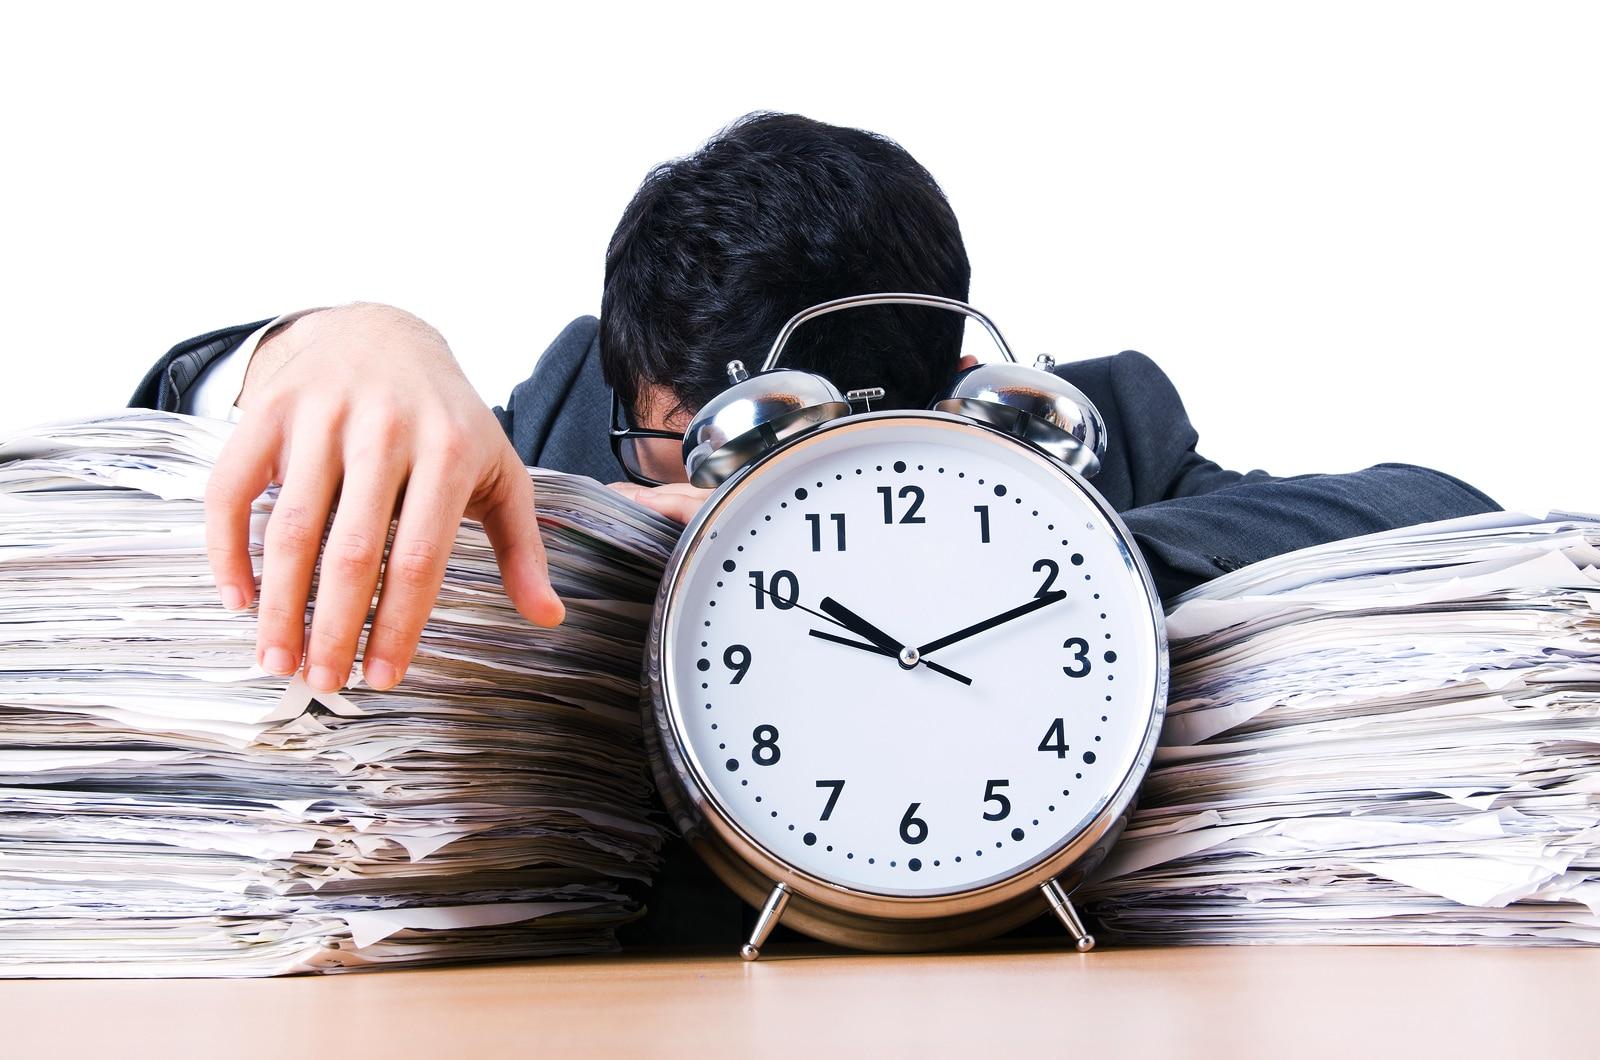 Successfull Time Management